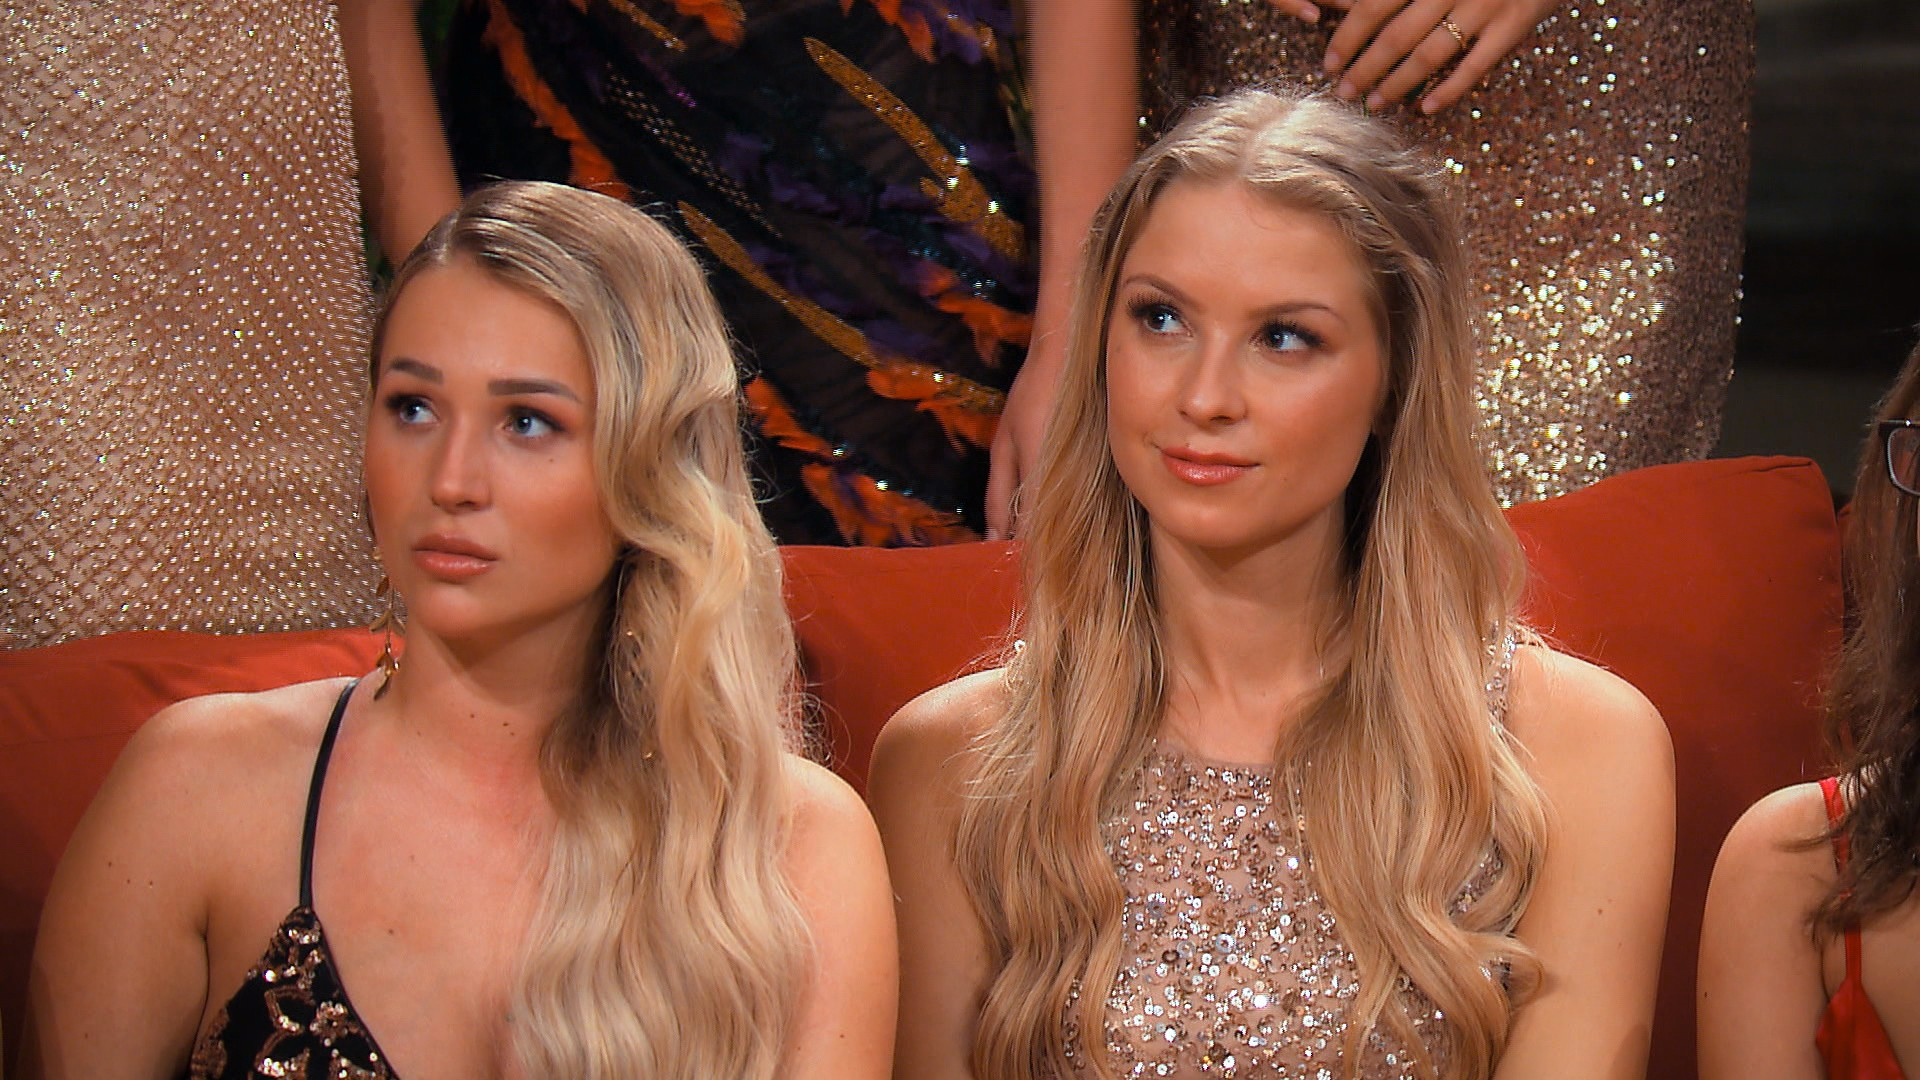 Der Bachelor 2020 Folge 1 - Birgit und Rebecca